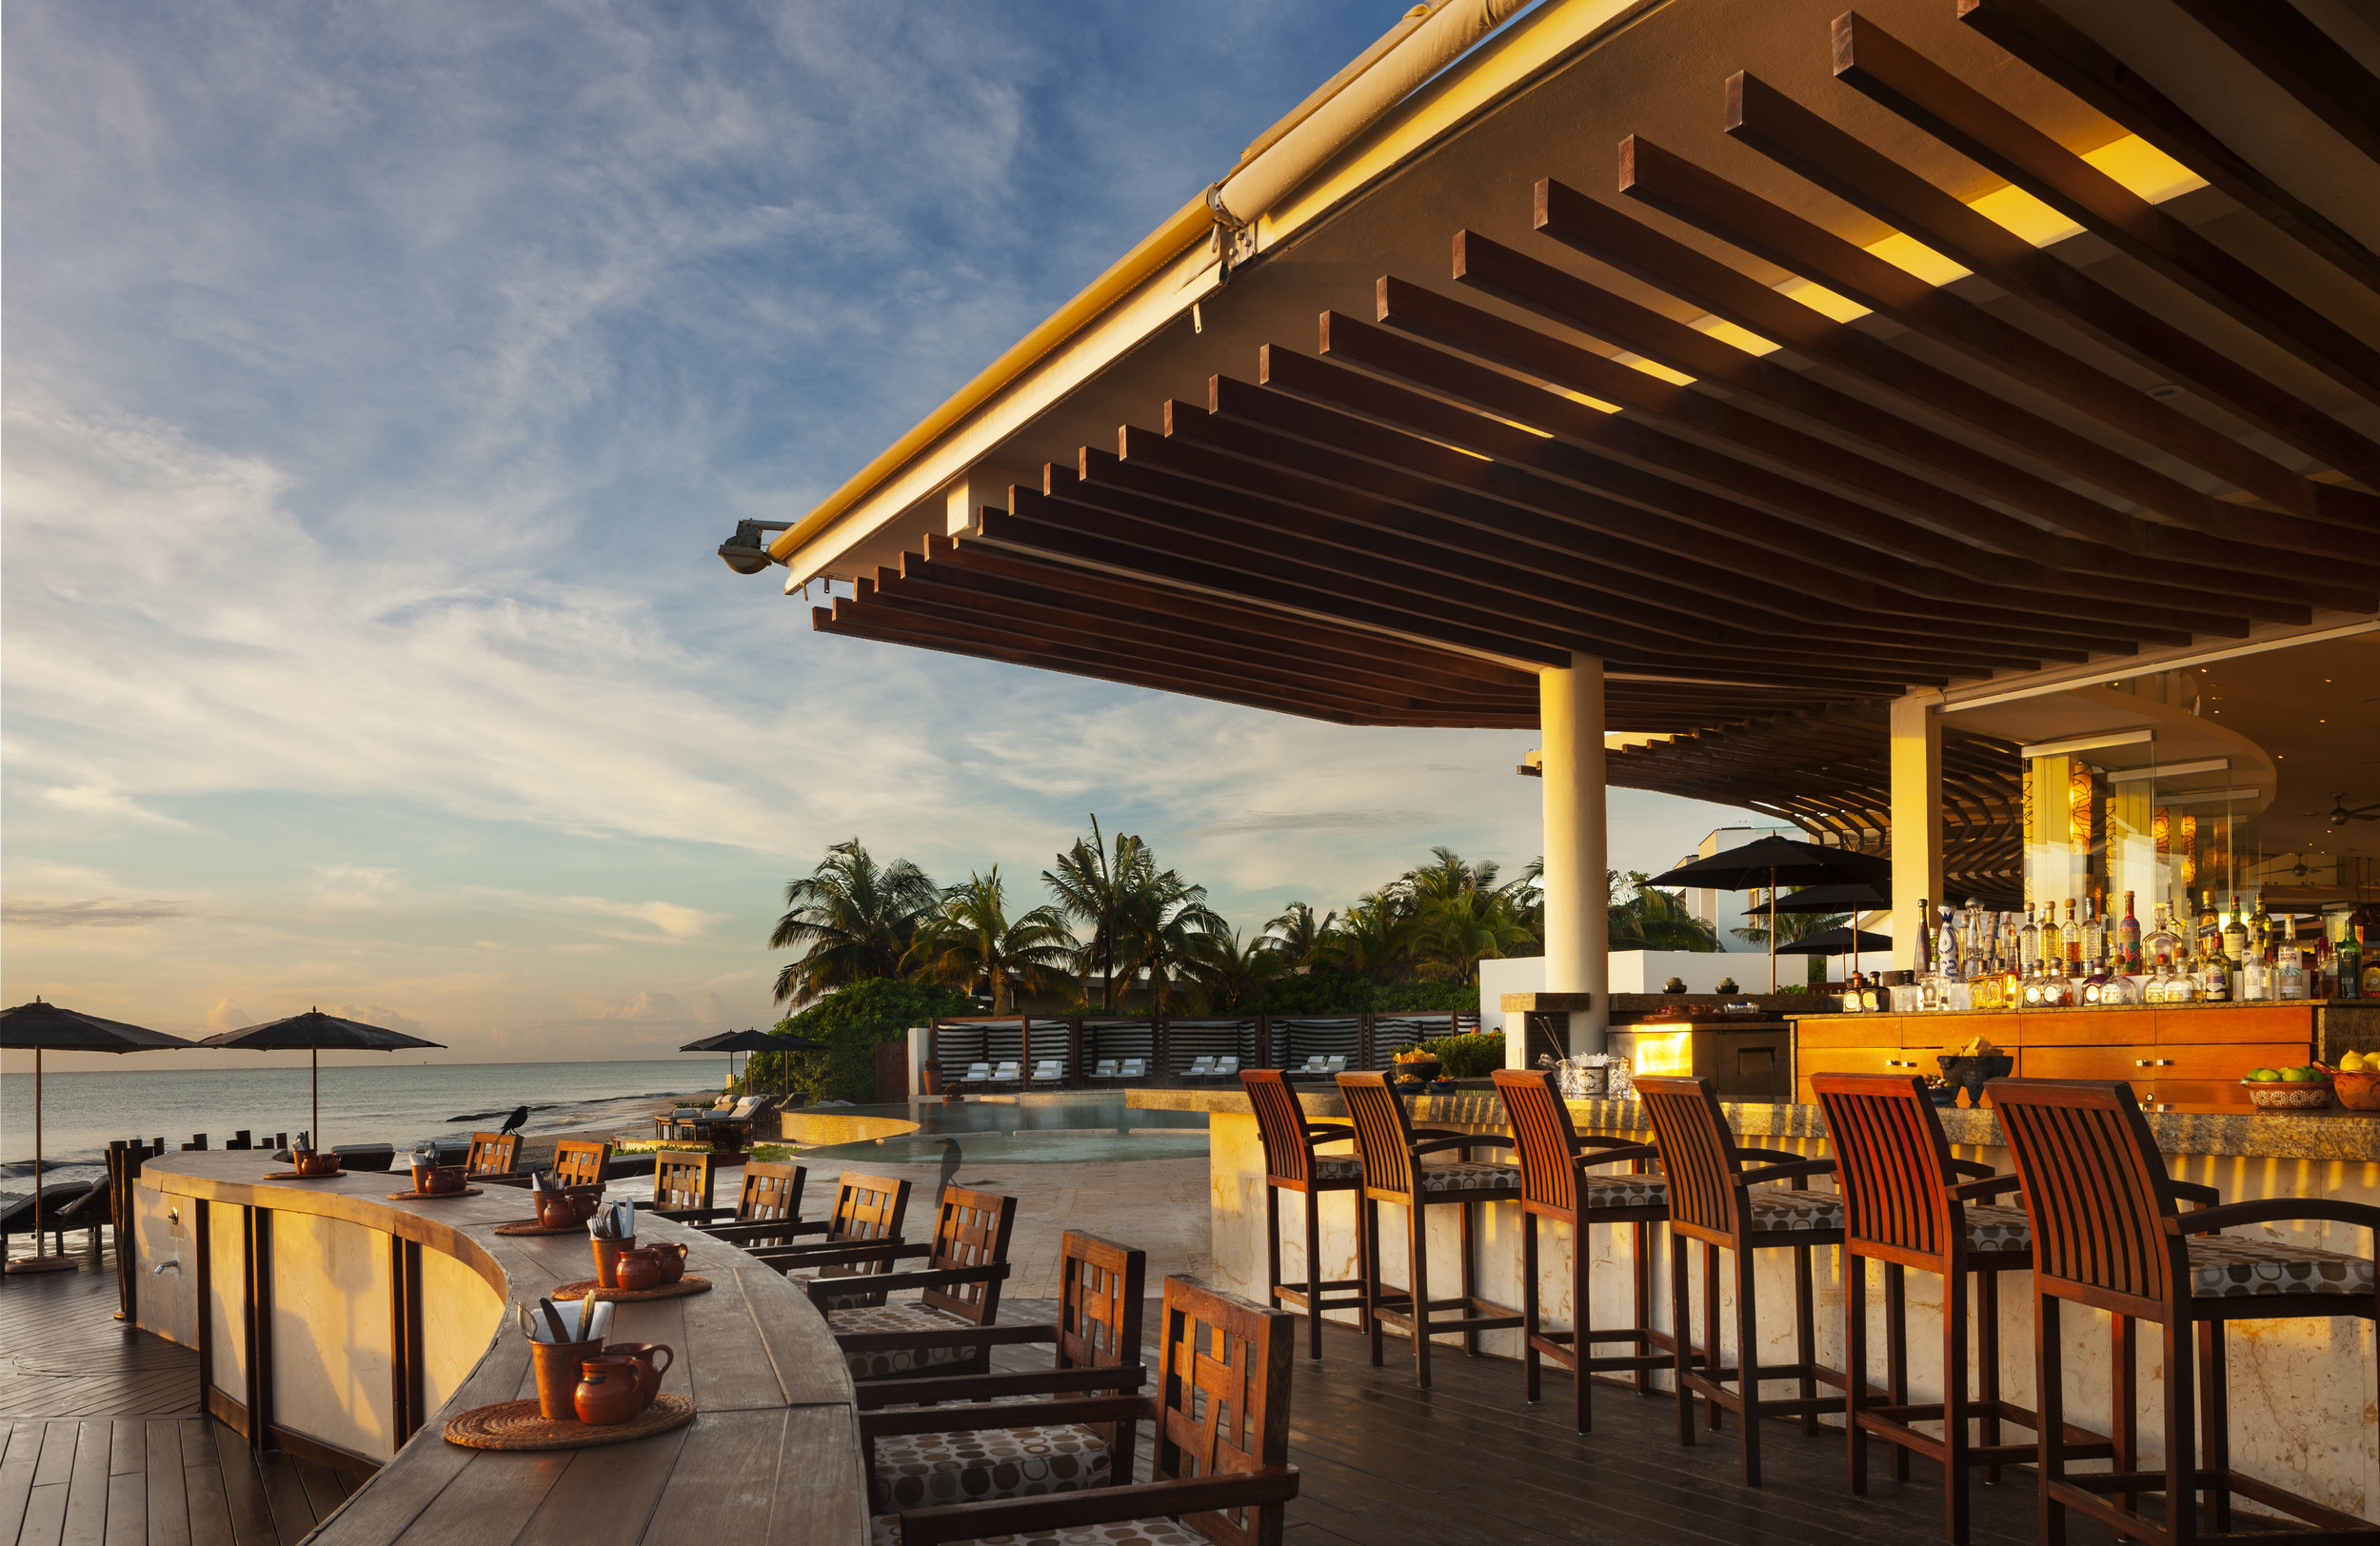 Rosewood_Mayakoba08 daylight - Punta Bonita Bar.jpg